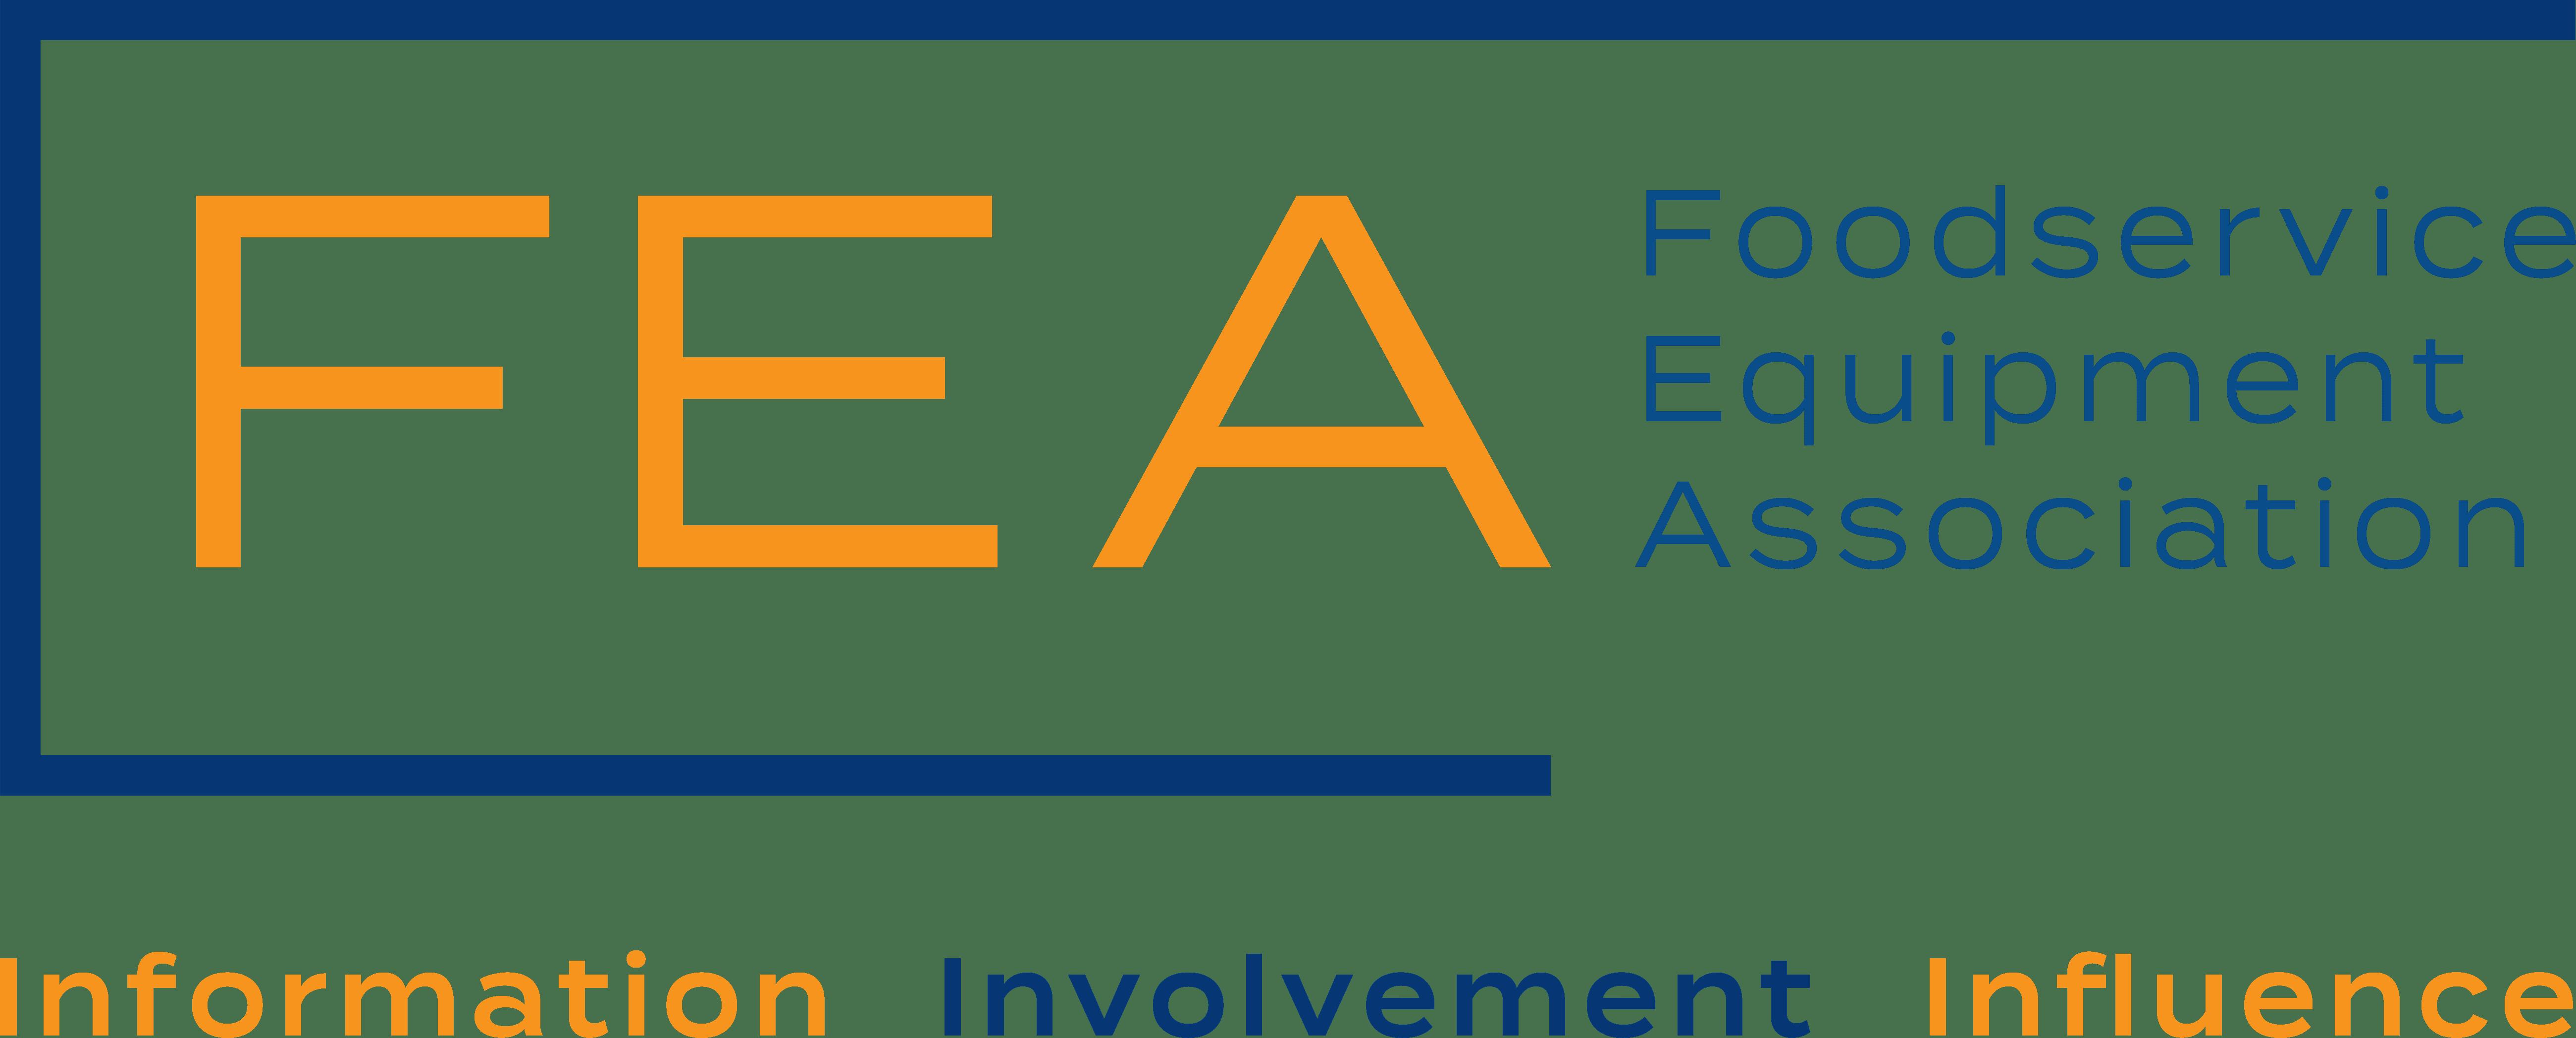 FEA-Foodservice Equipment Association